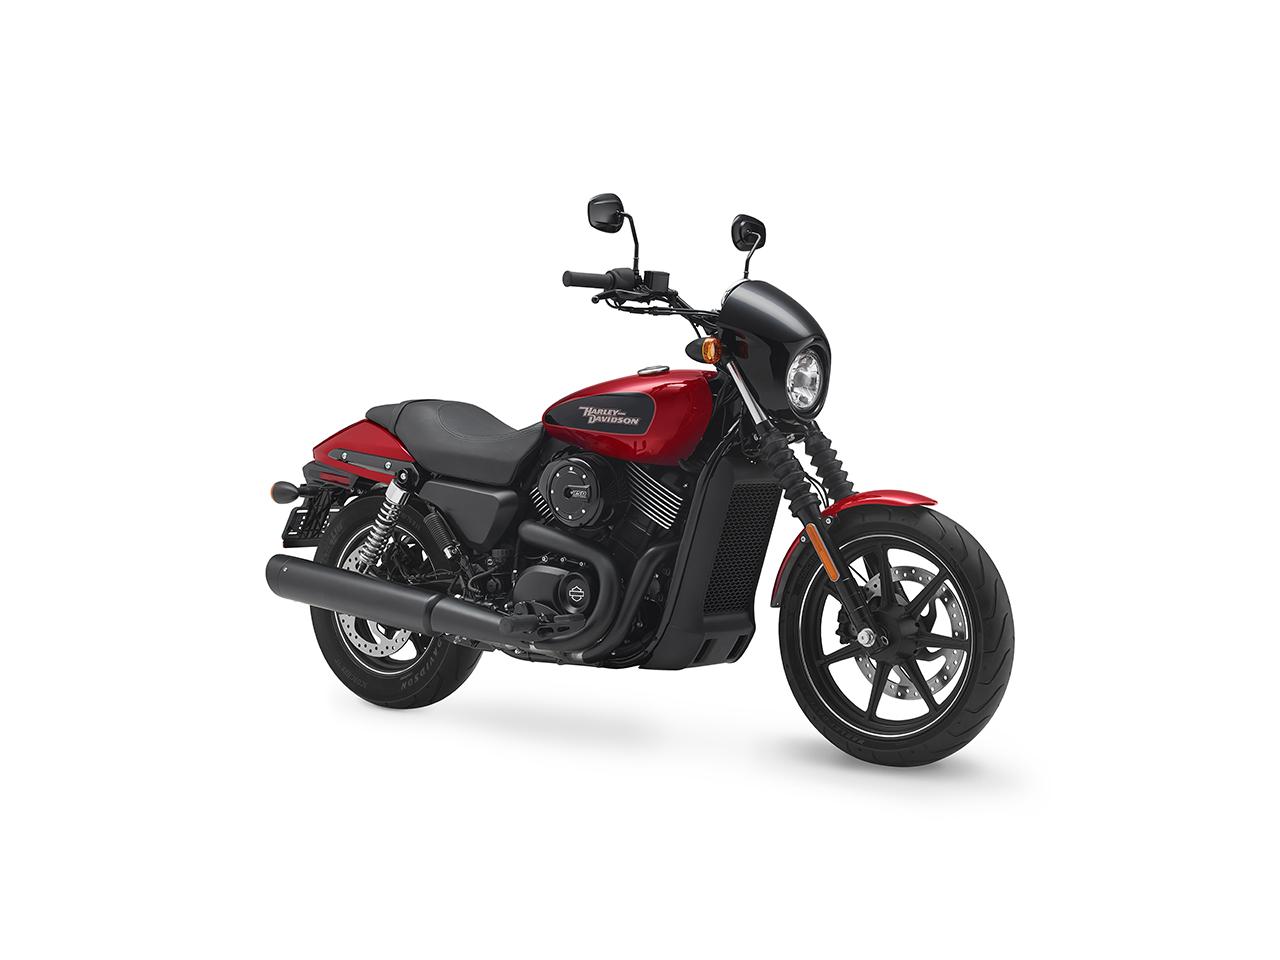 2018 Harley-Davidson Street 750 Image